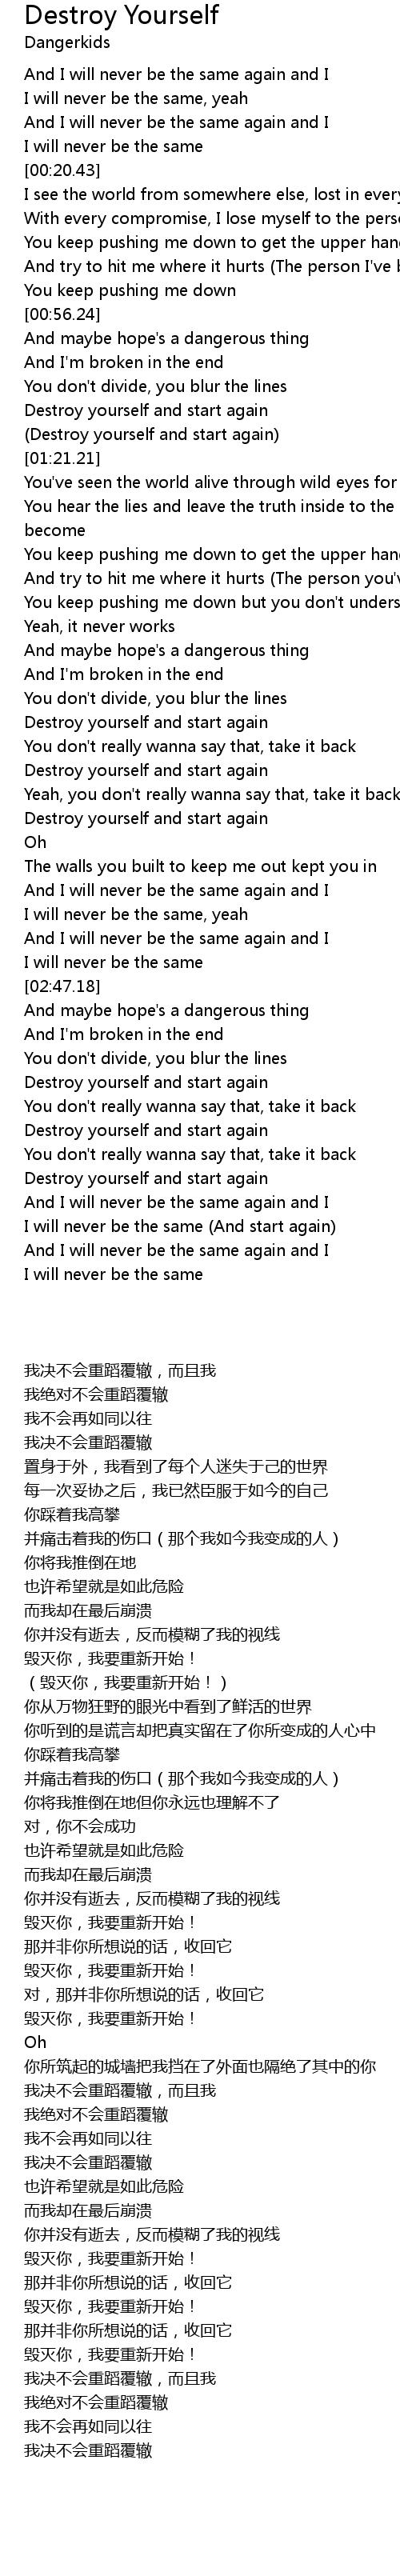 Destroy Yourself Lyrics Follow Lyrics